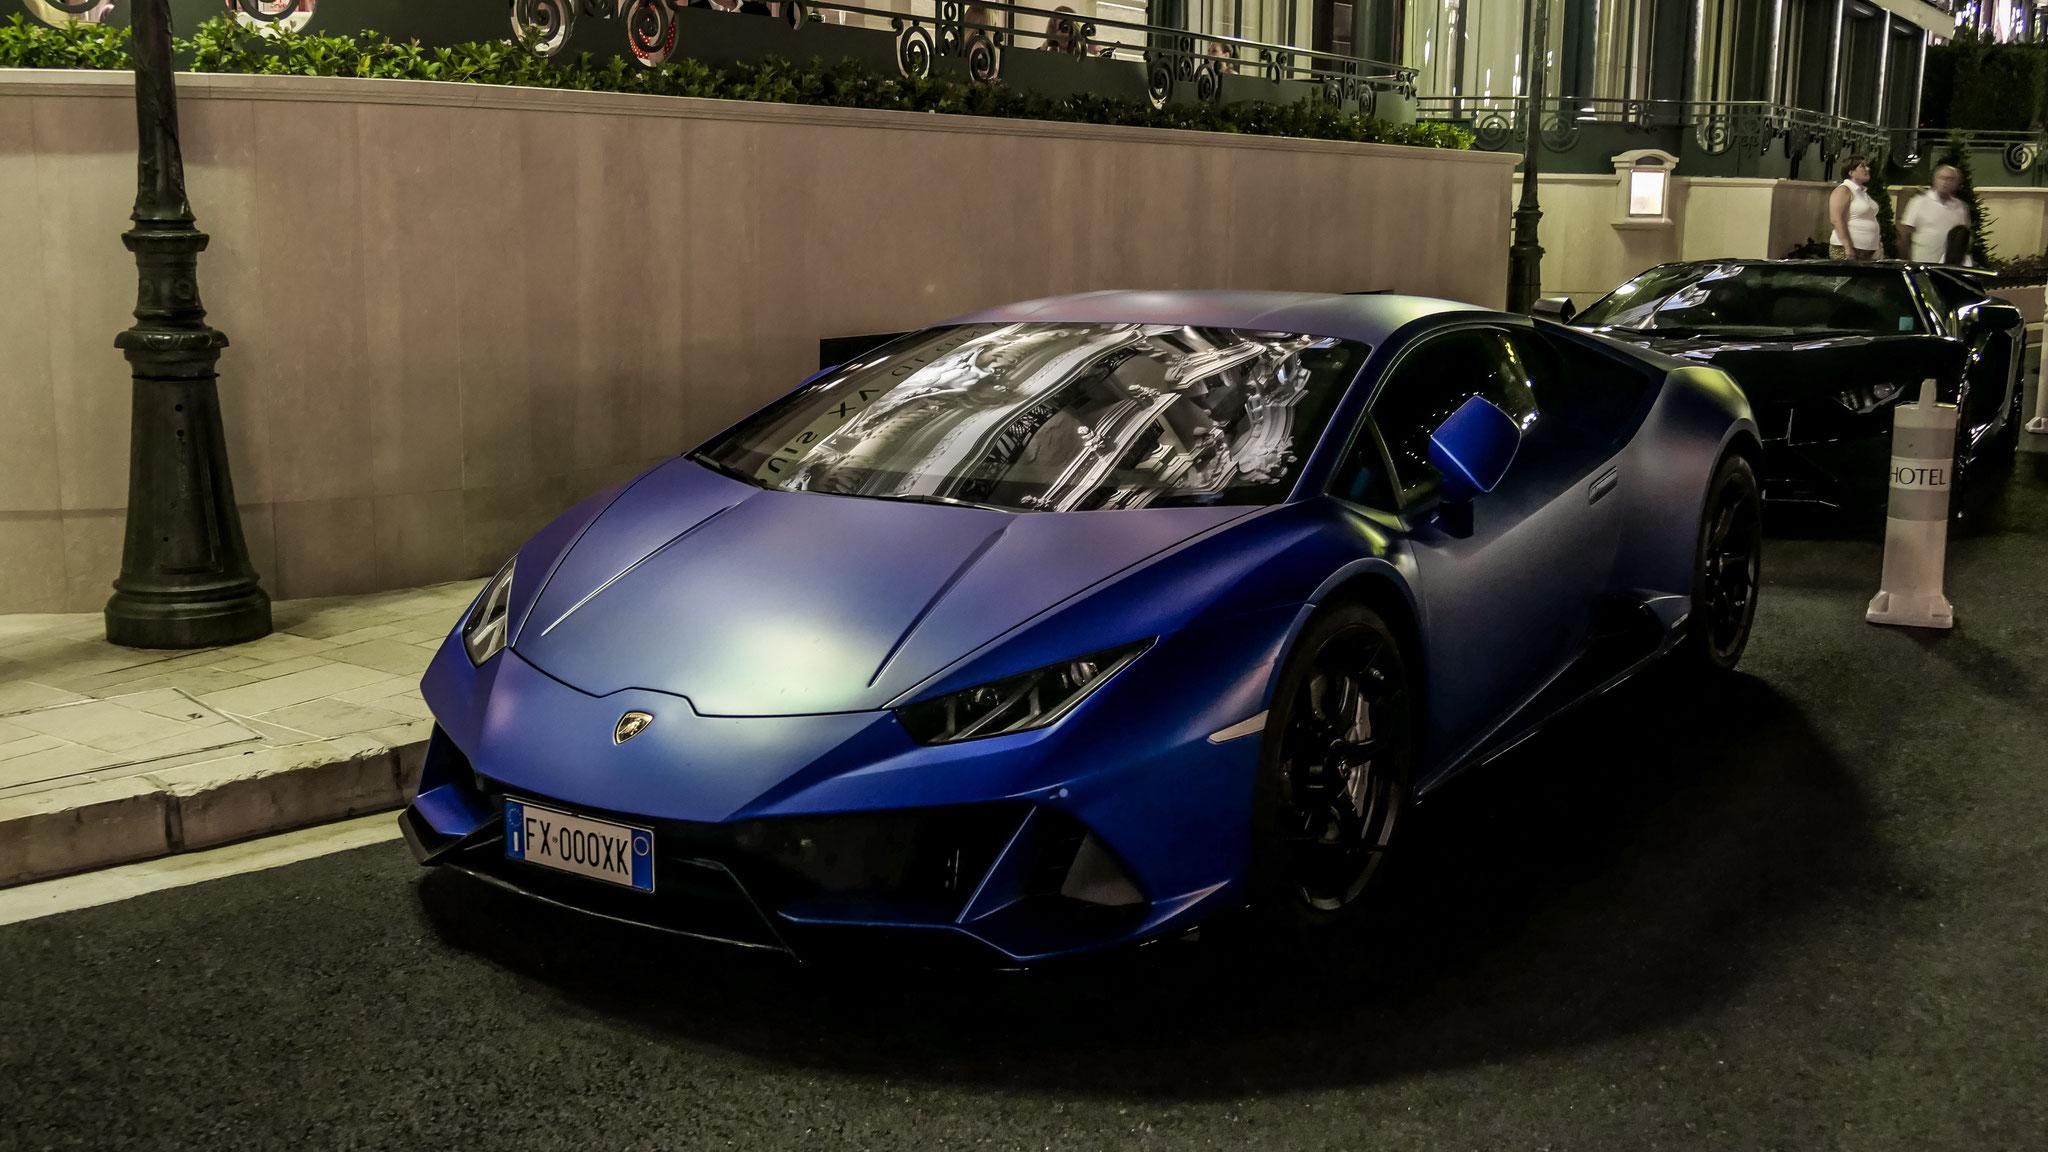 Lamborghini Huracan Evo - FX-000-XK (ITA)